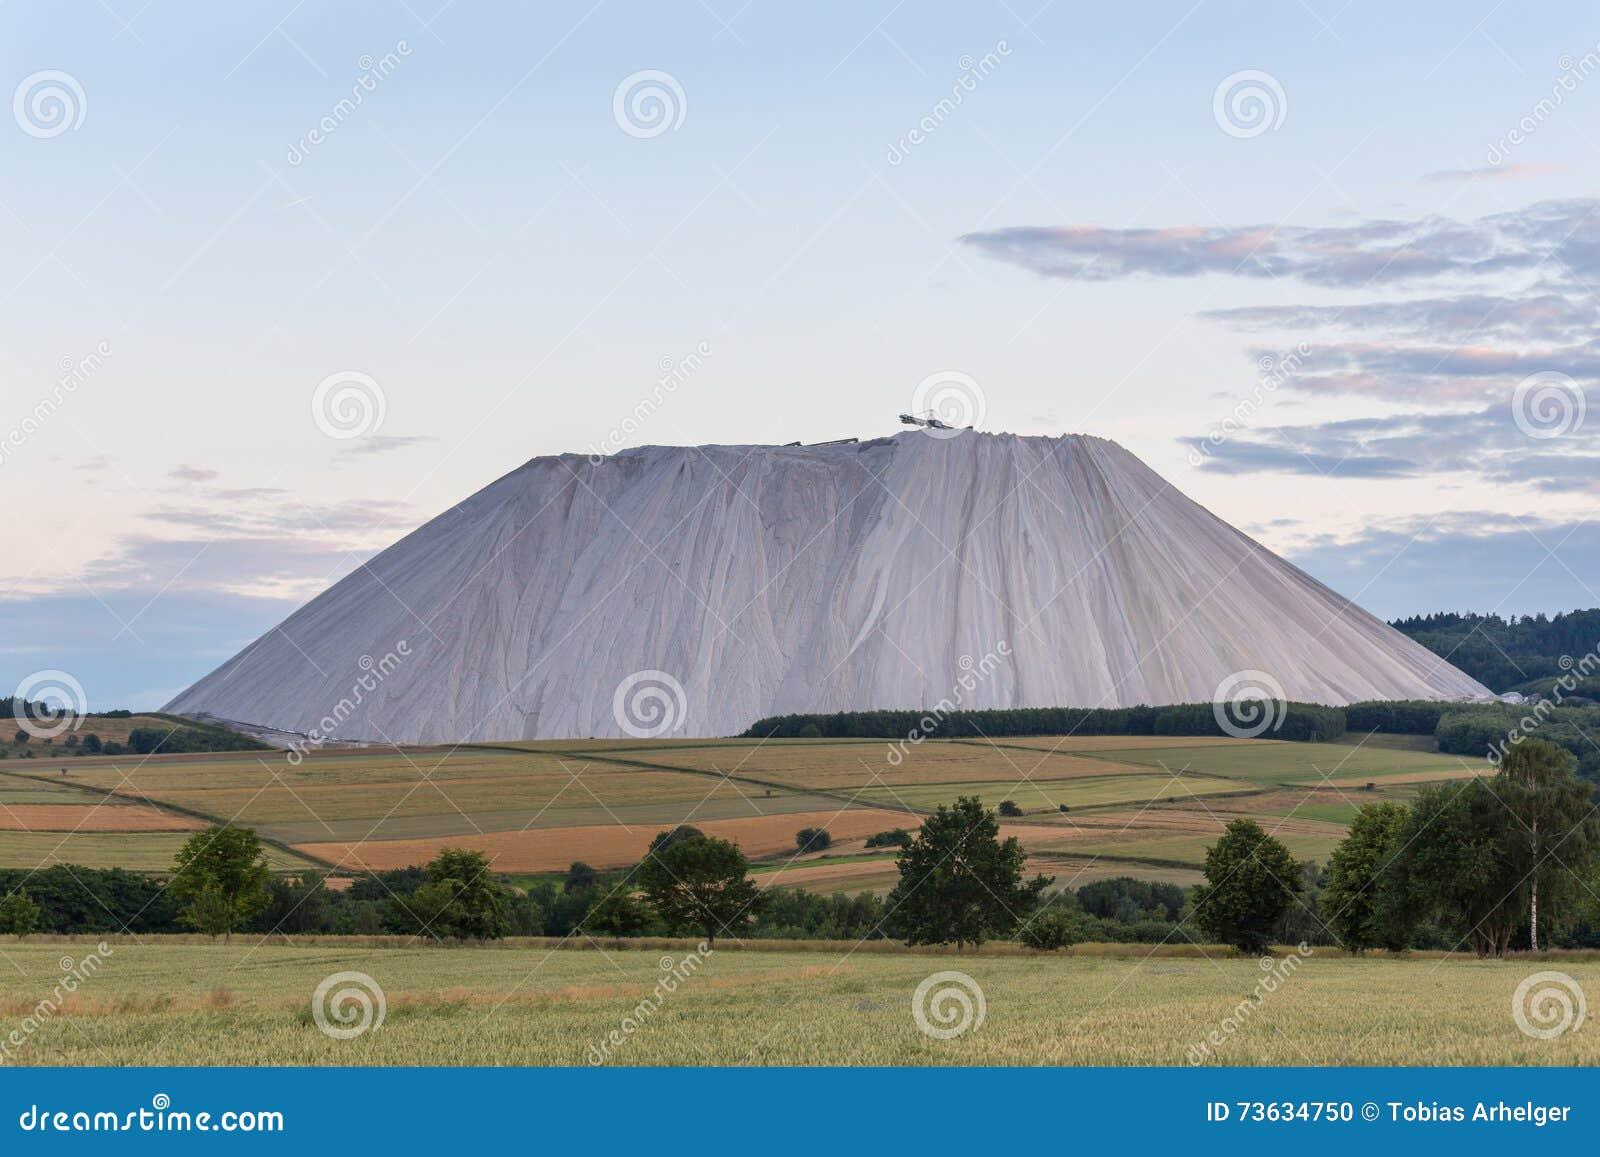 Amazing salt mountain in Germany